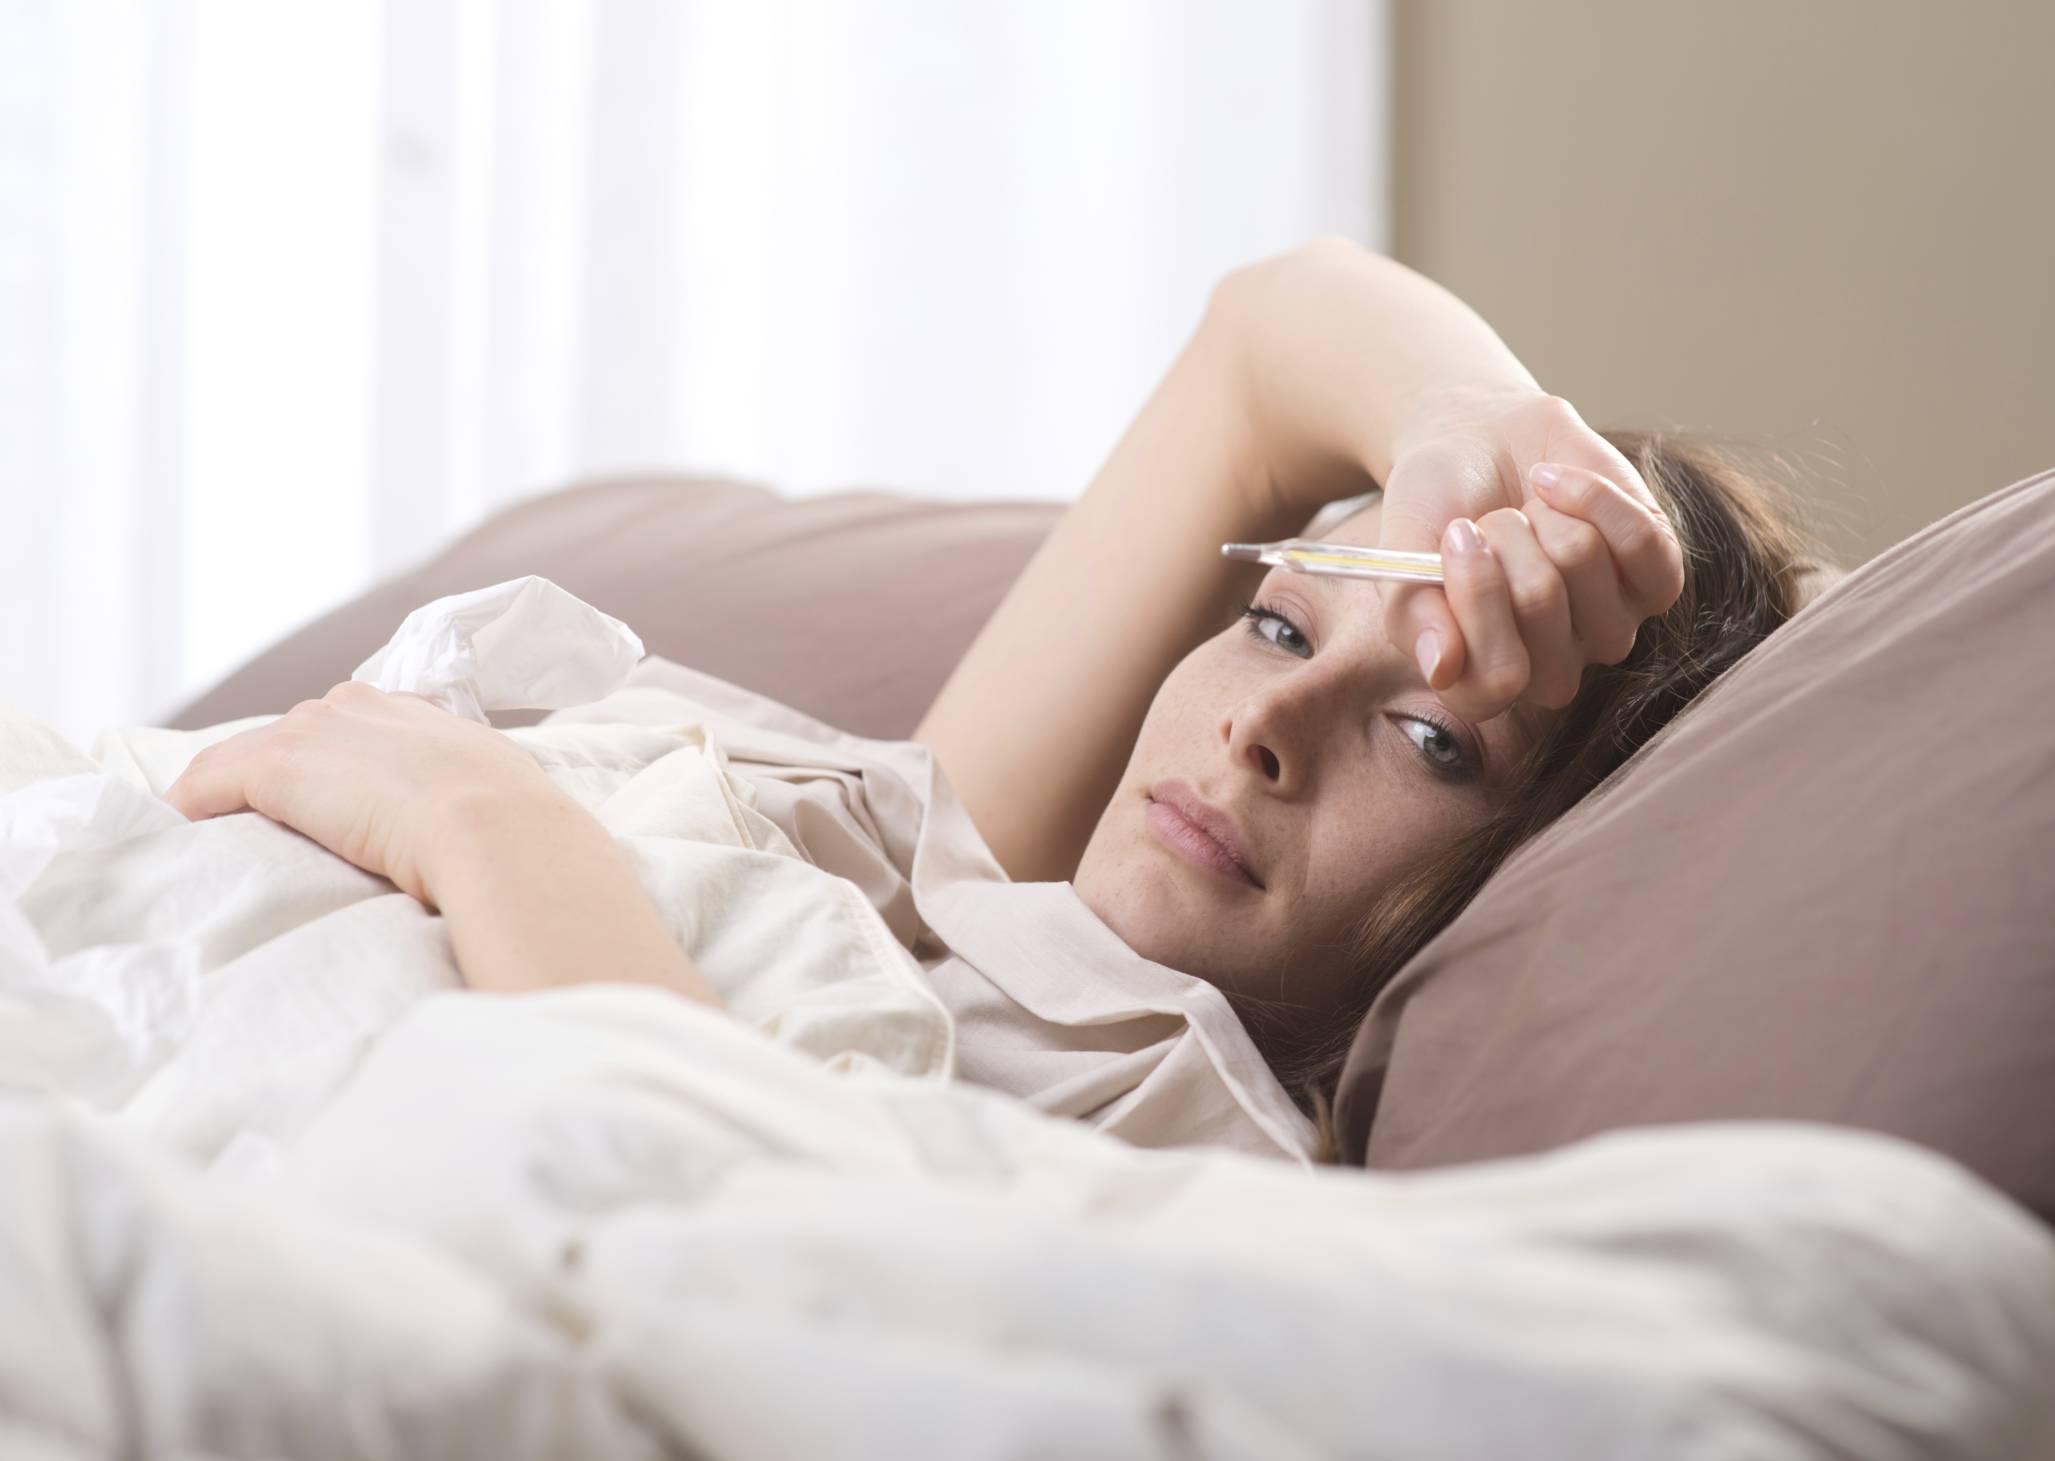 6 Rimedi Naturali Per Abbassare La Febbre